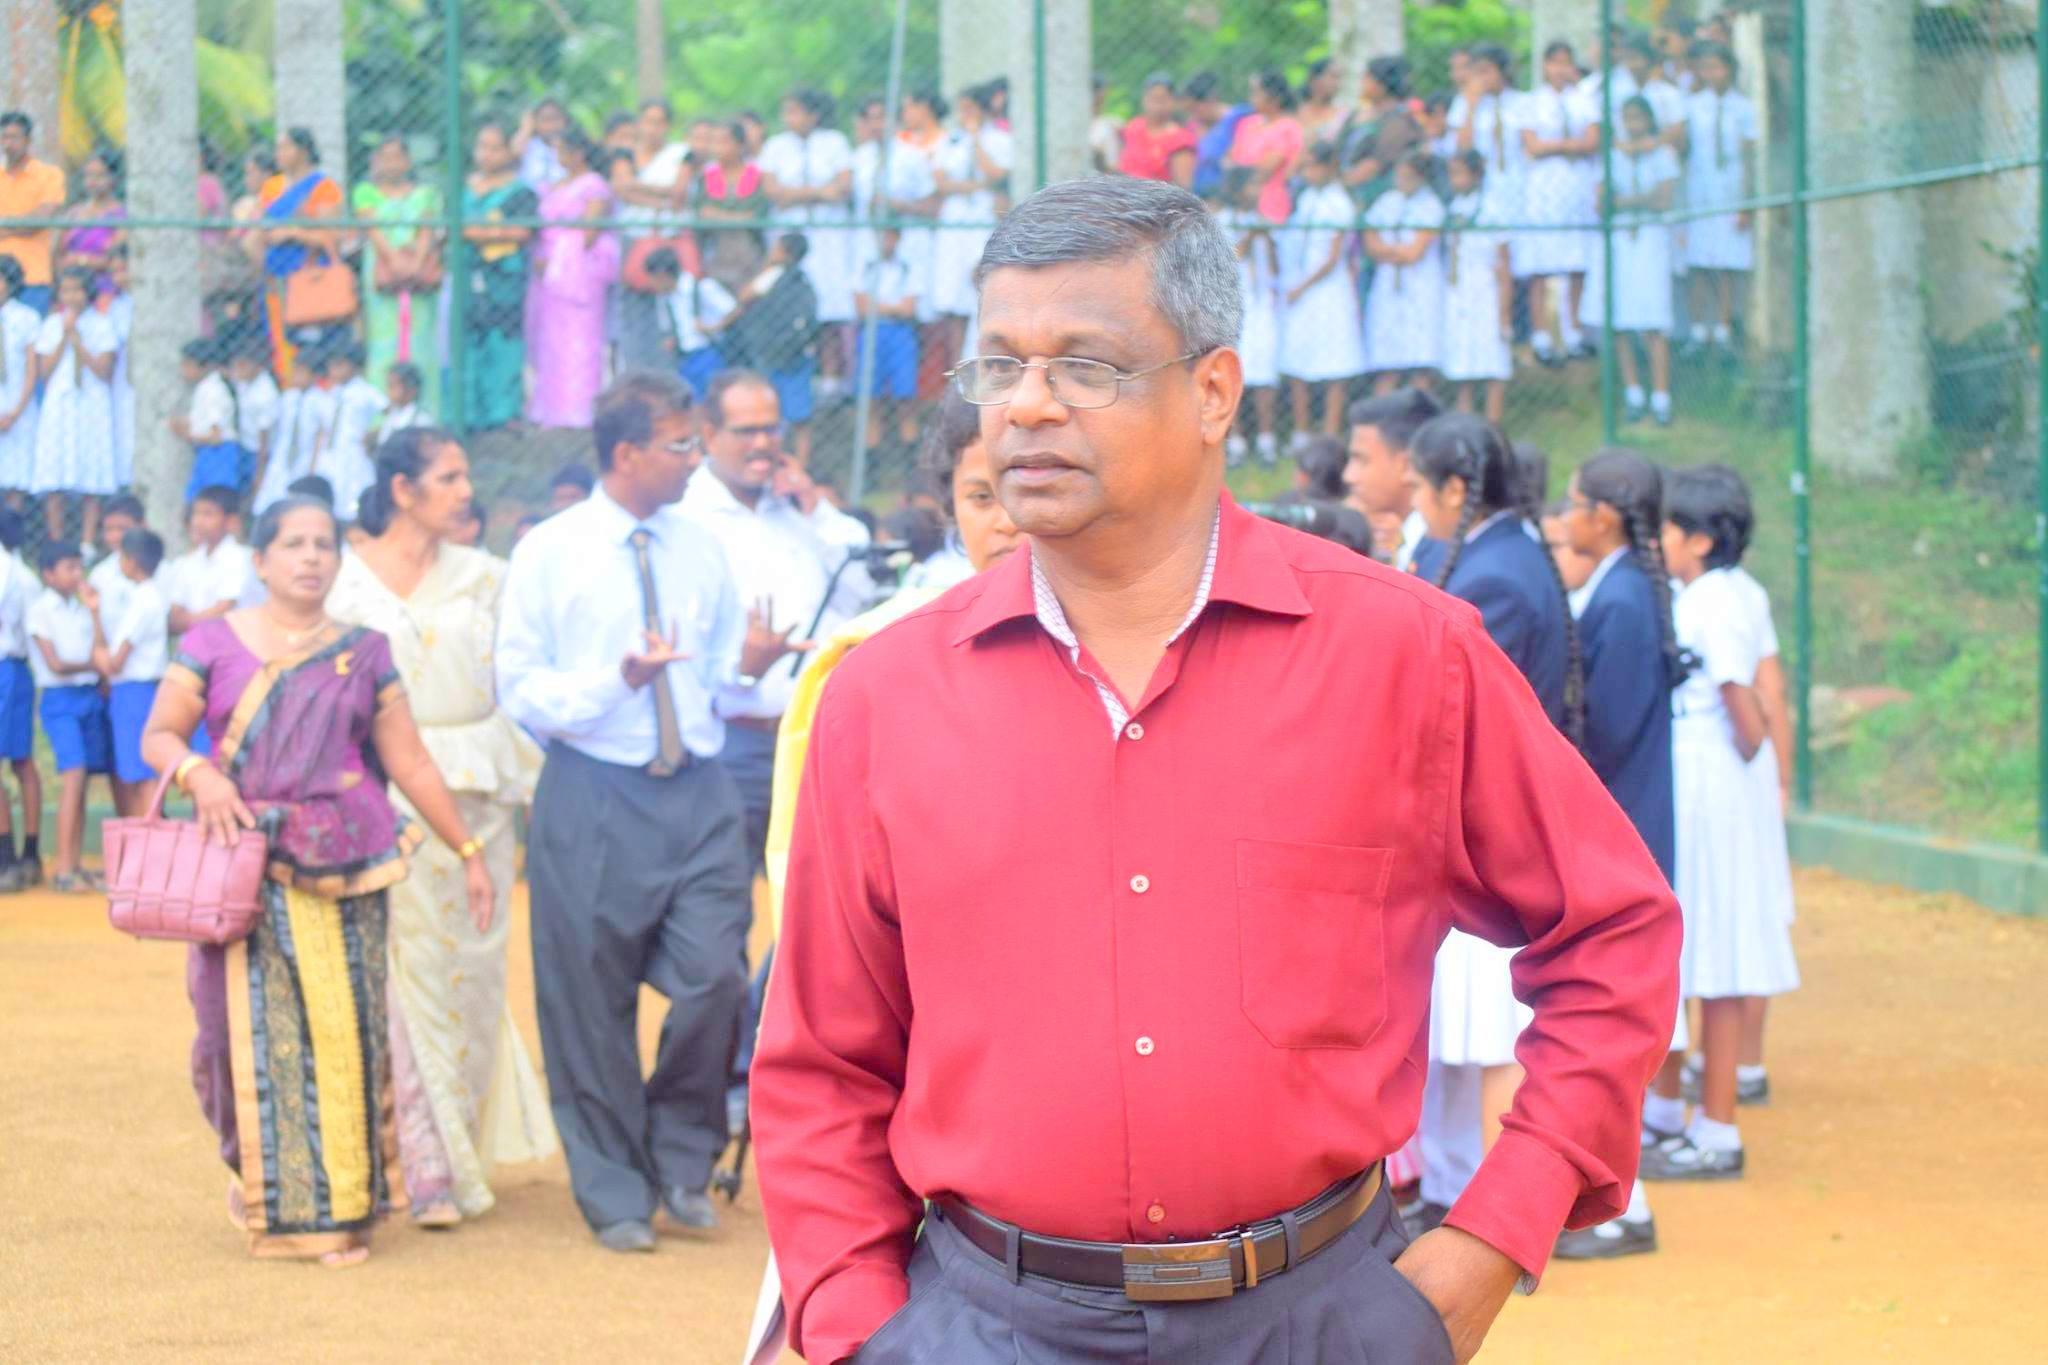 Dudley Senanayake Central College